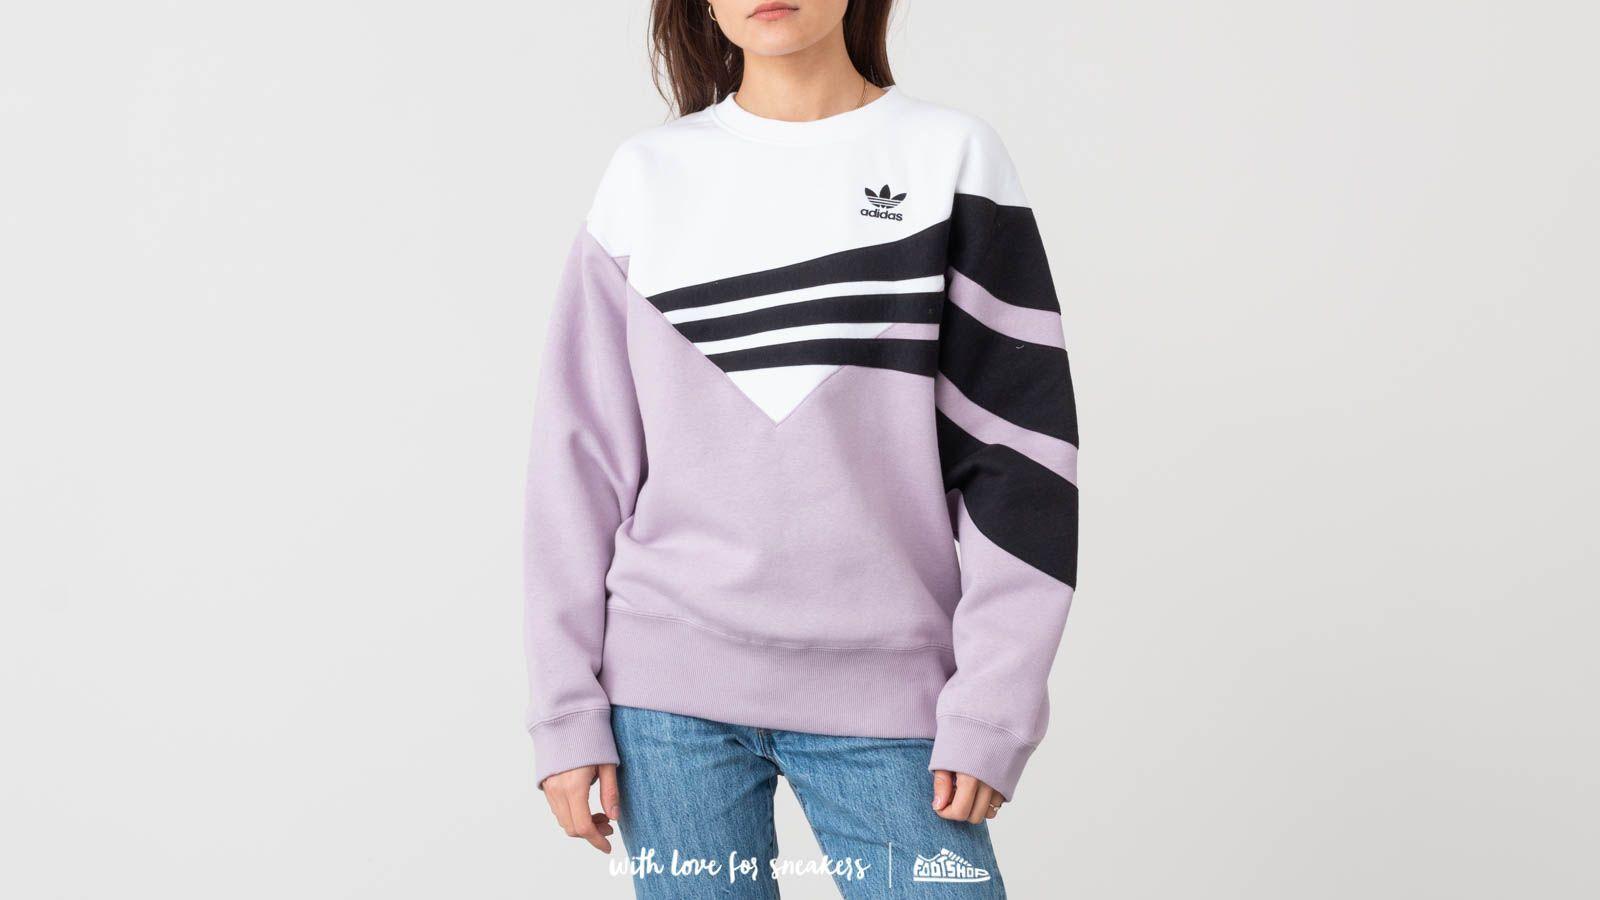 white and black adidas sweatshirt